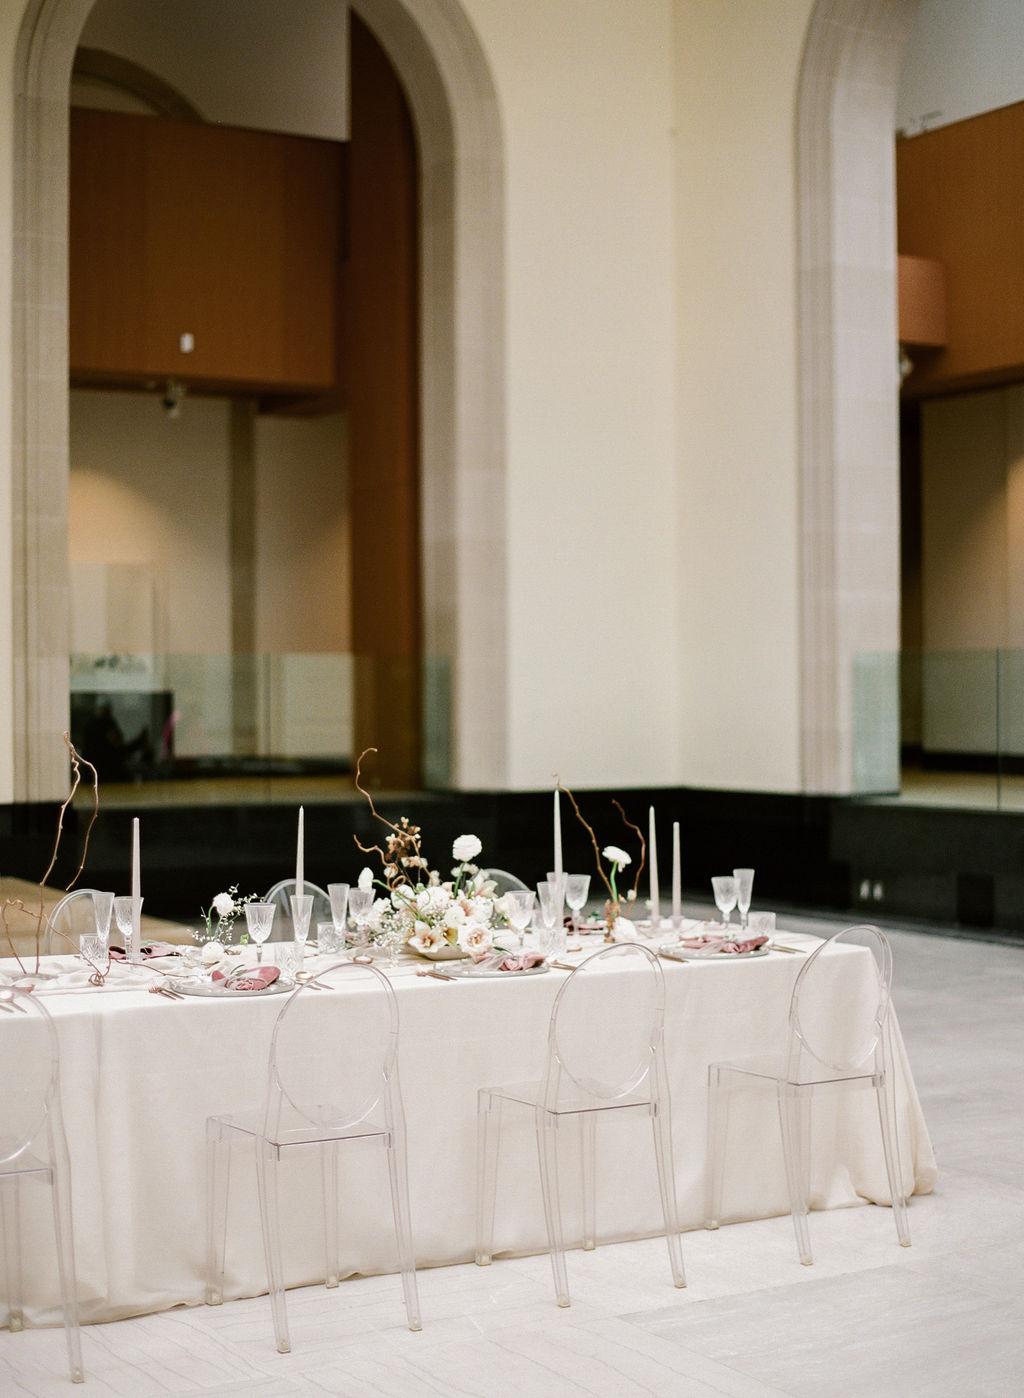 artiese-ago-wedding-editorial-000423610013.jpg